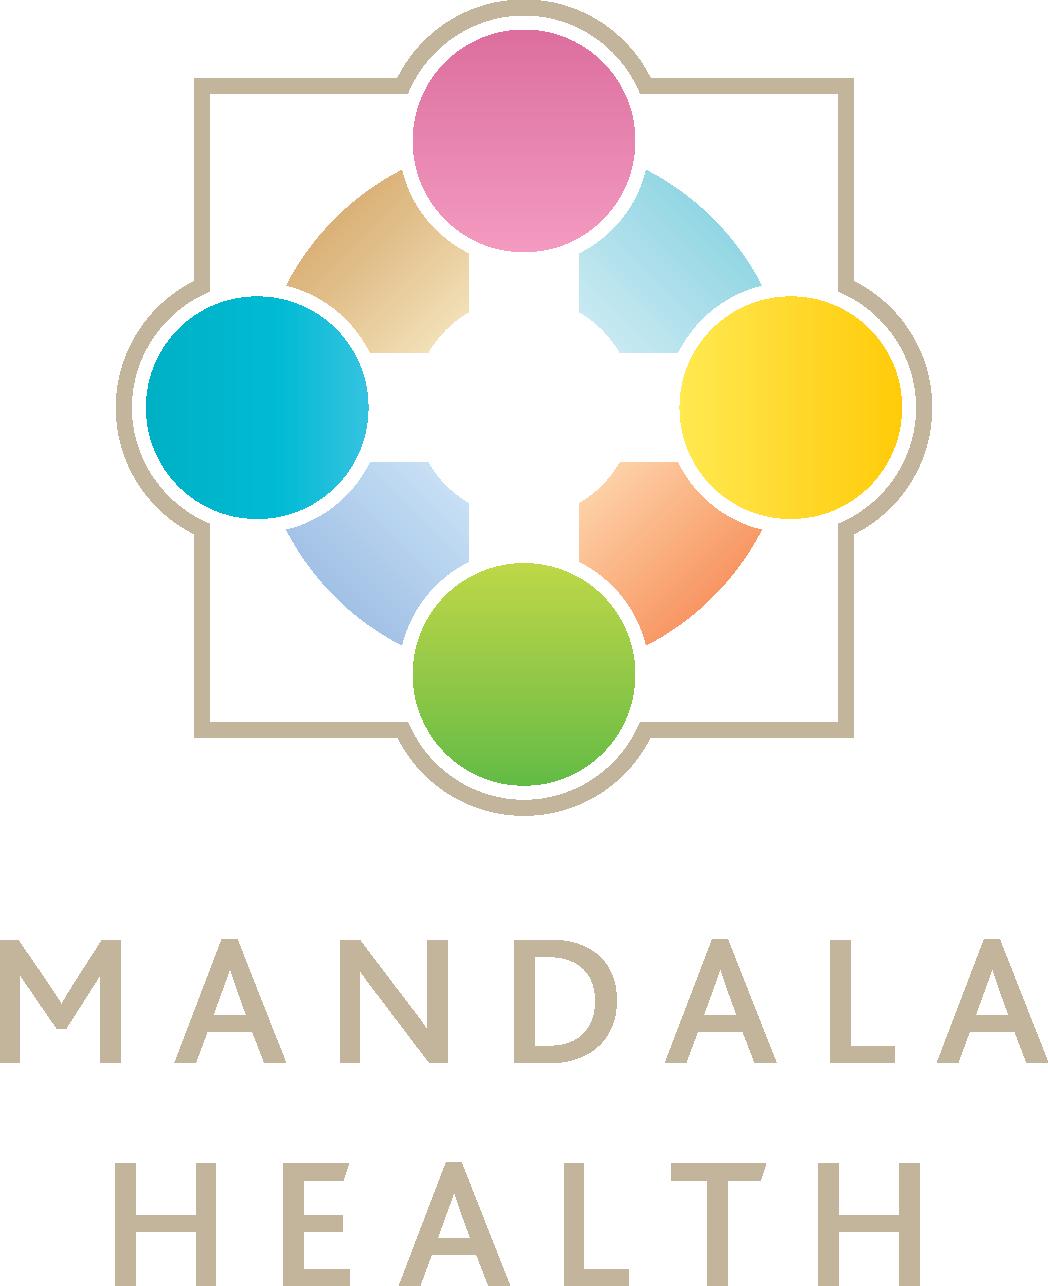 Mandala Health